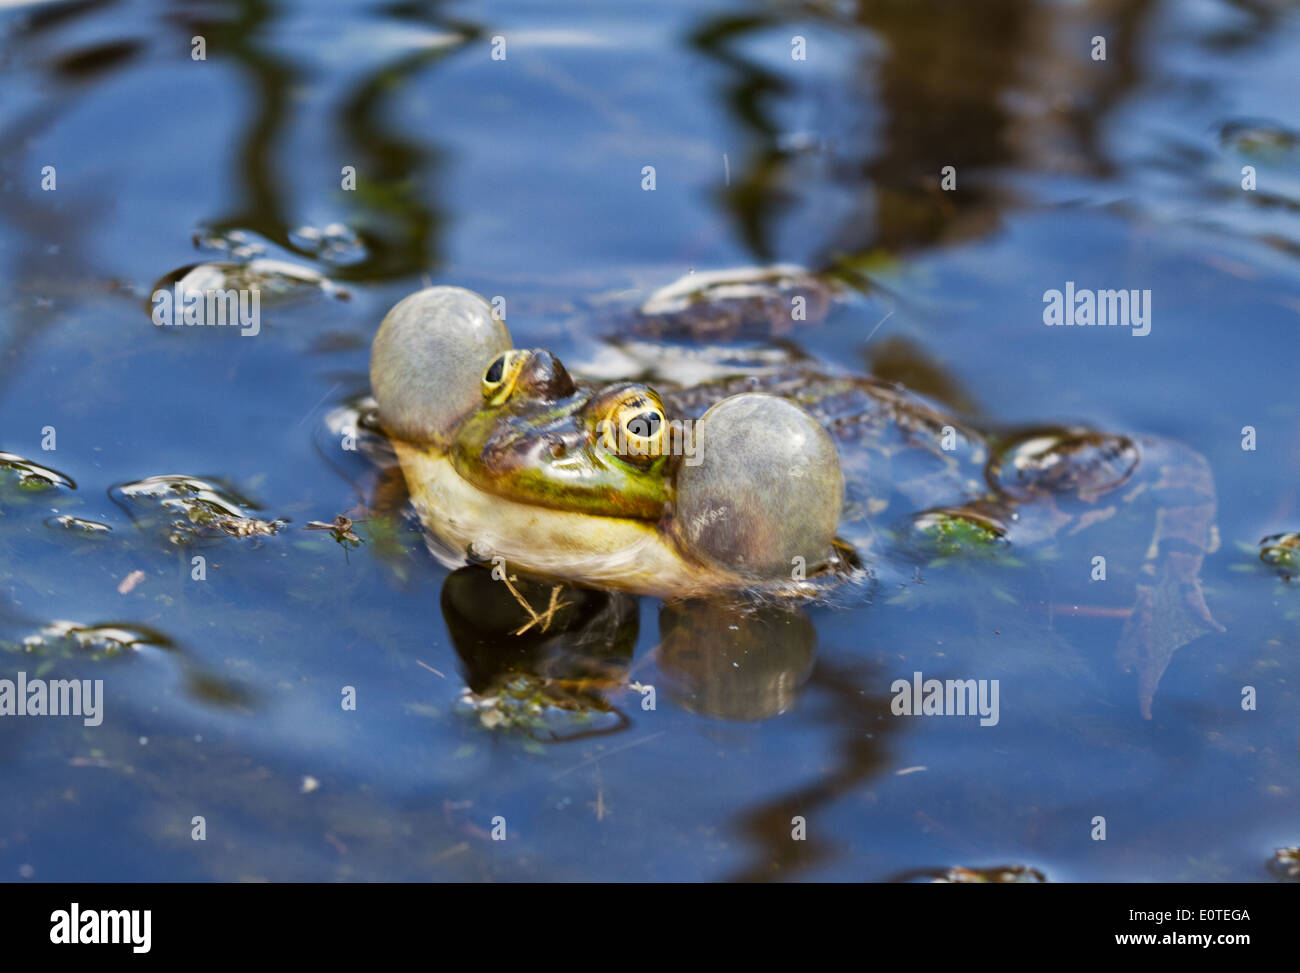 Green frog croaking - Stock Image